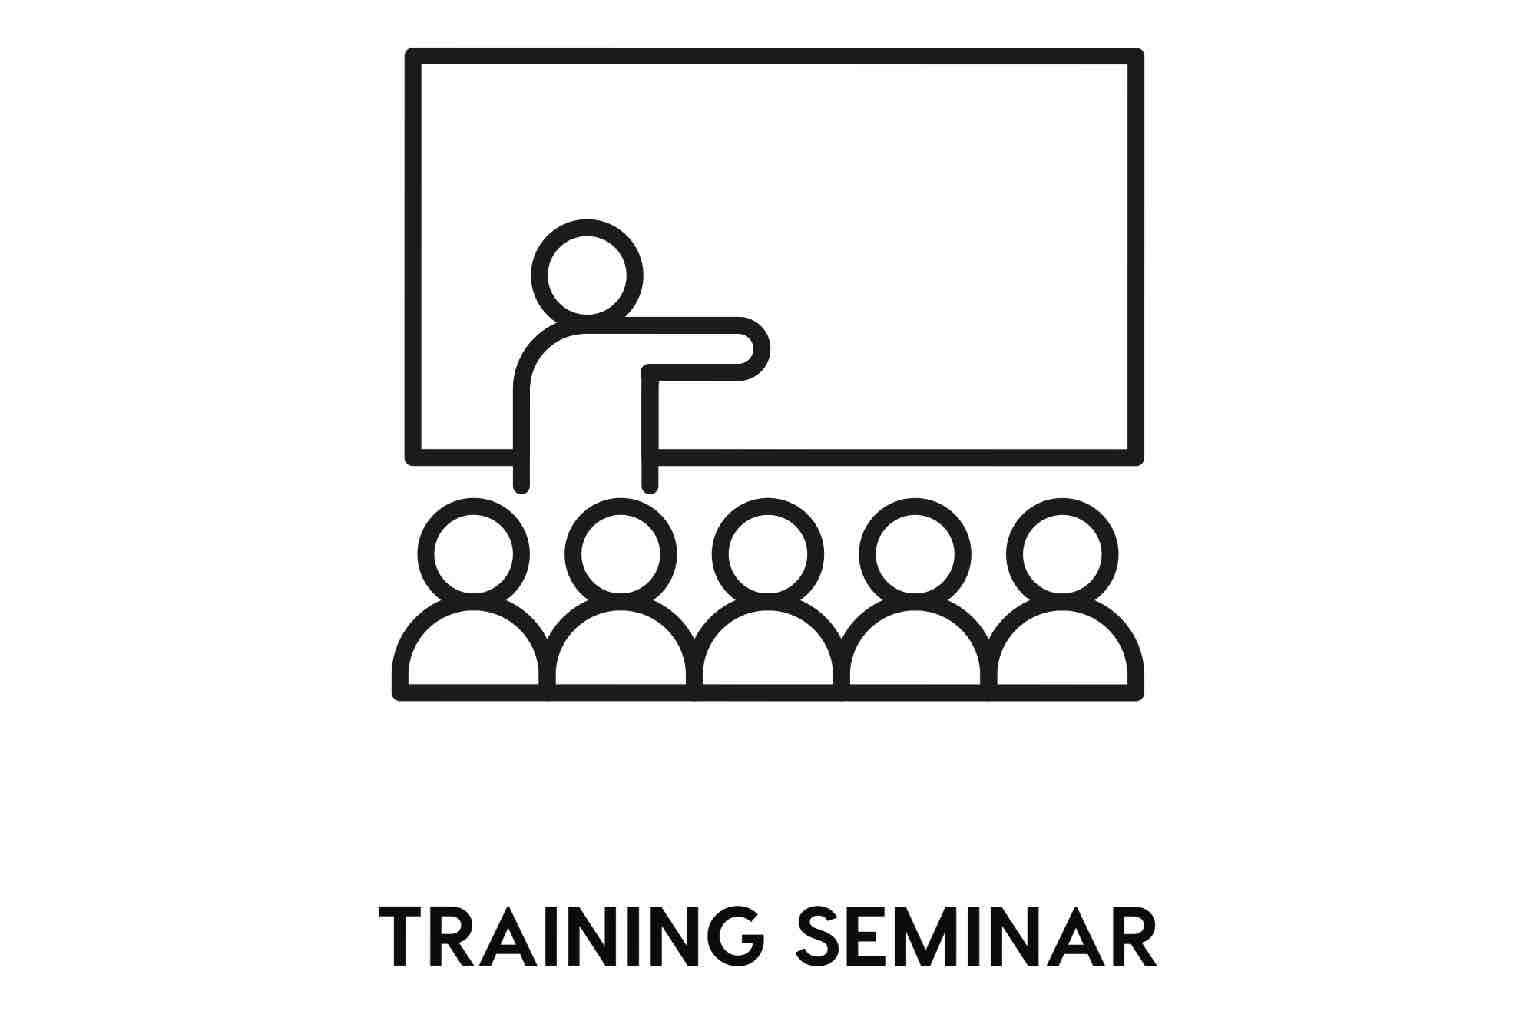 Icon for a training seminar